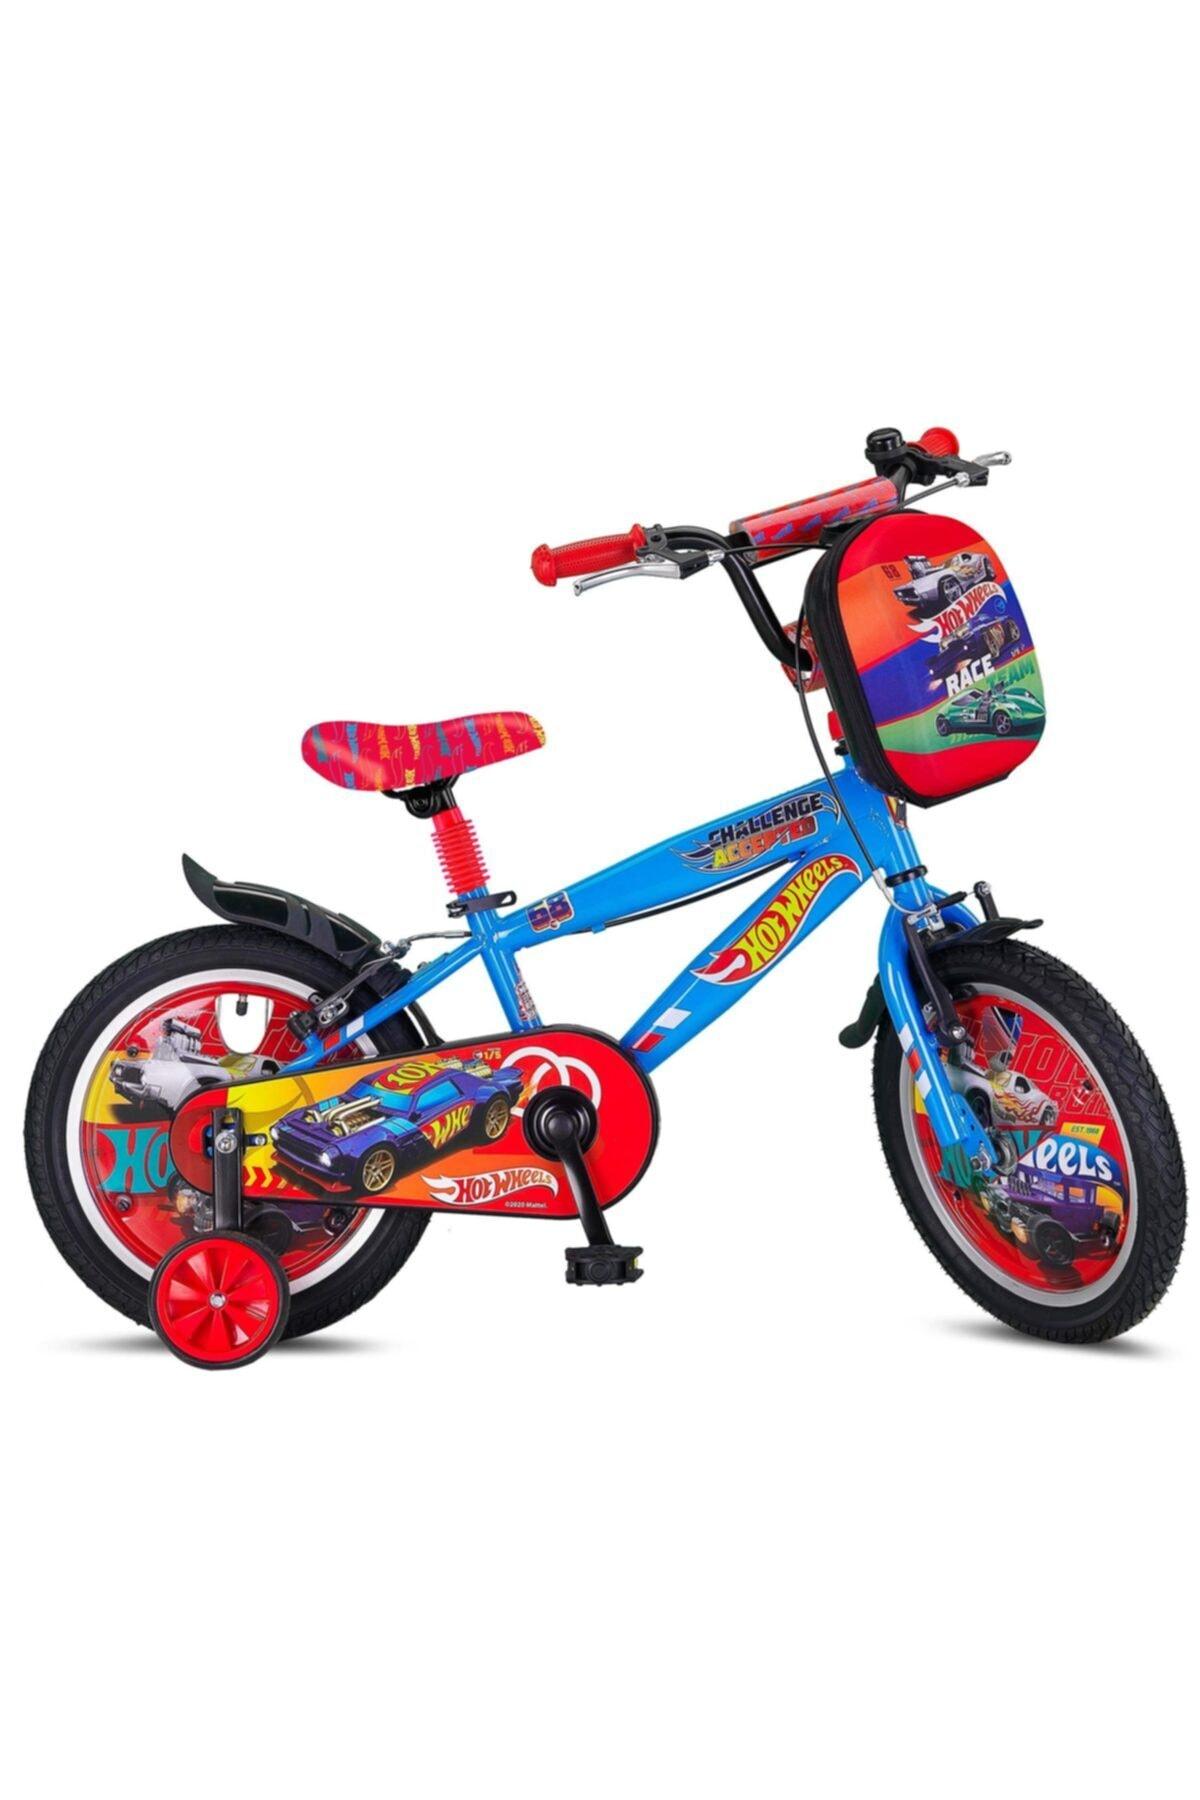 "2021 Ümit Hot Wheels BMX V 16"" Çocuk Bisikleti"